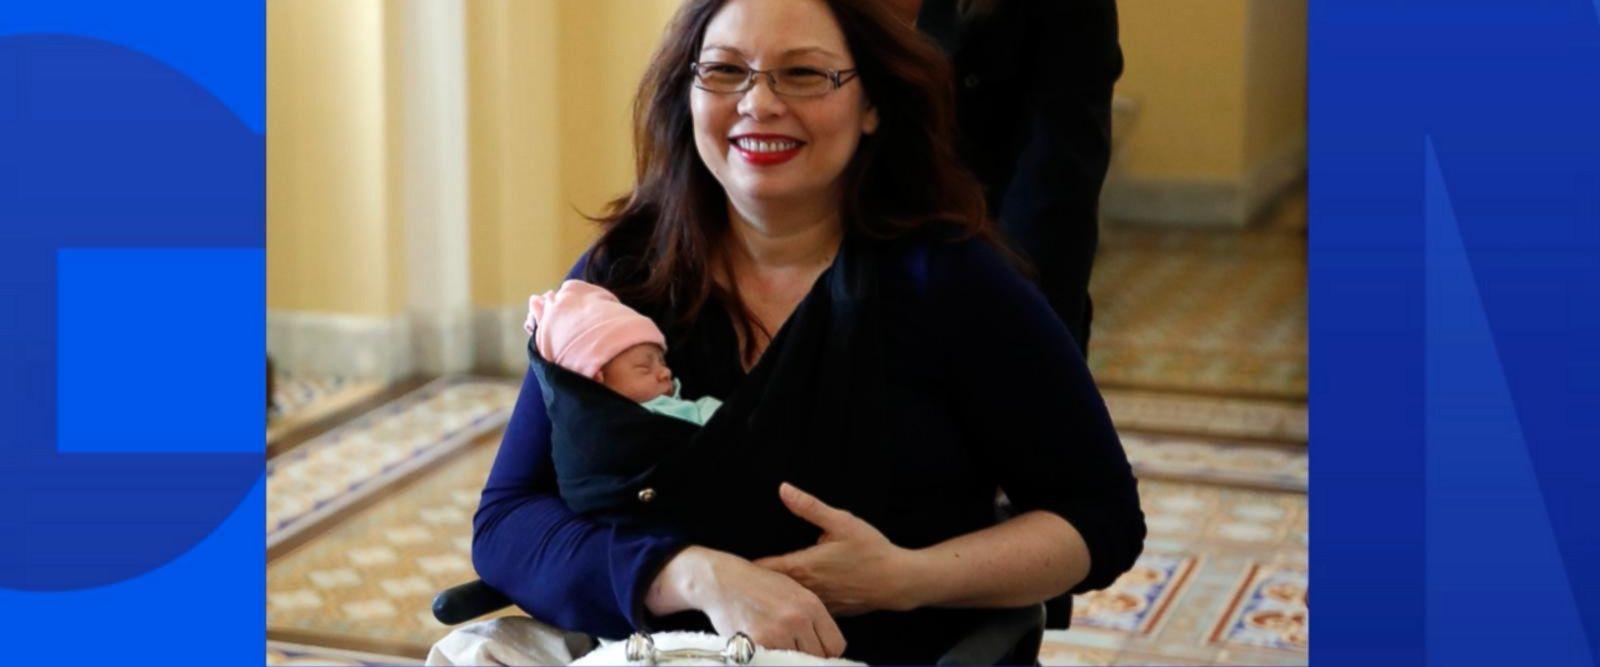 VIDEO: US Senator casts vote holding newborn